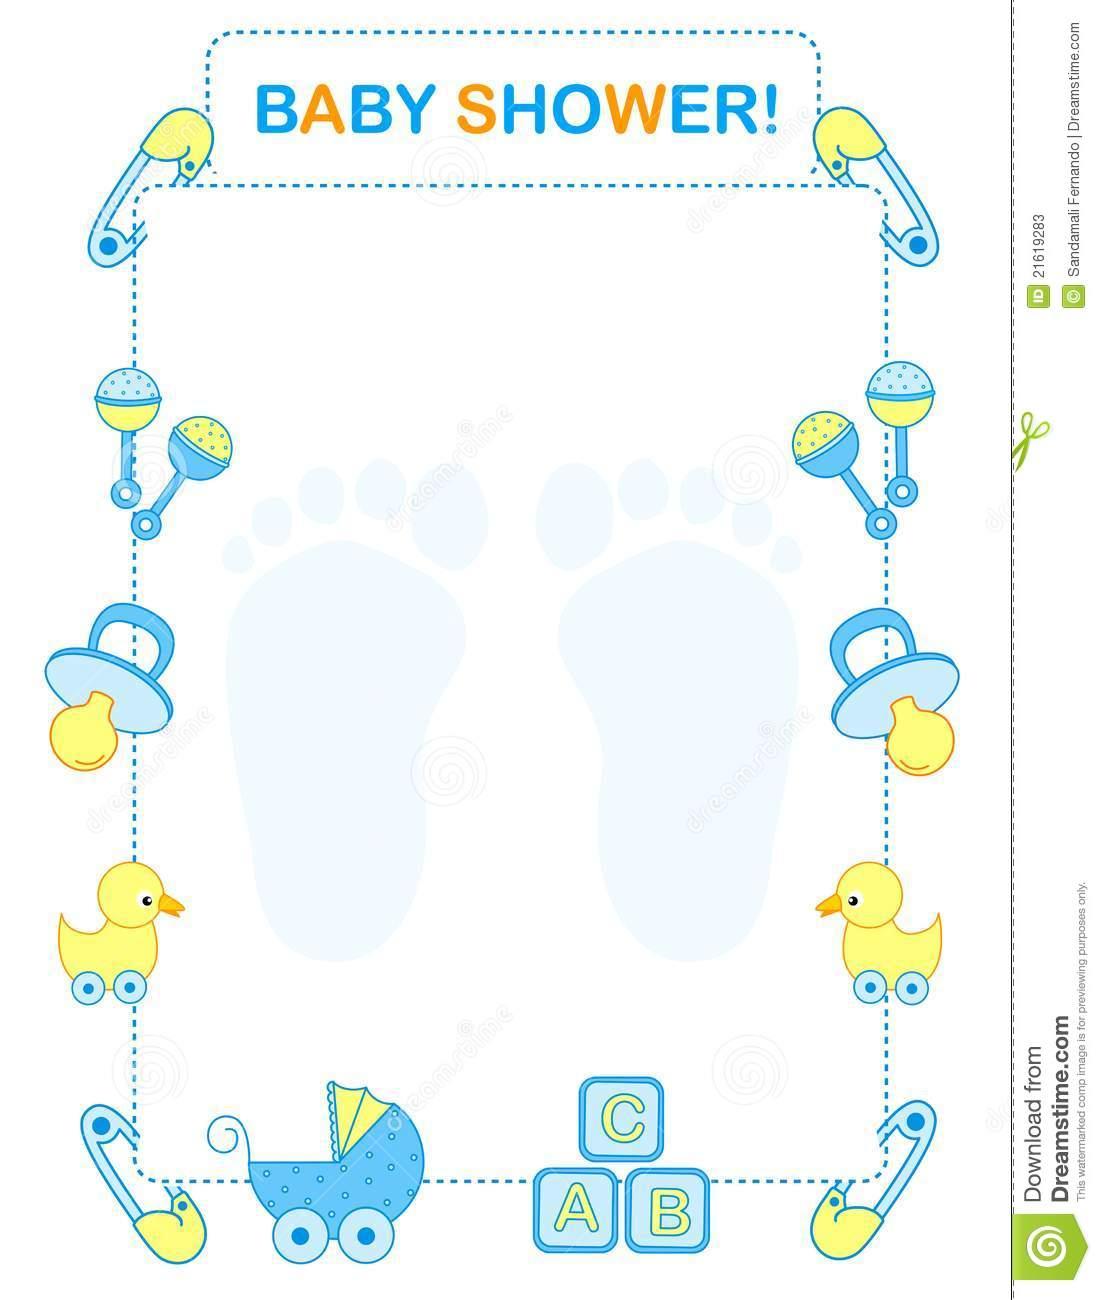 Baby shower invitation stock vector. Illustration of clipart.